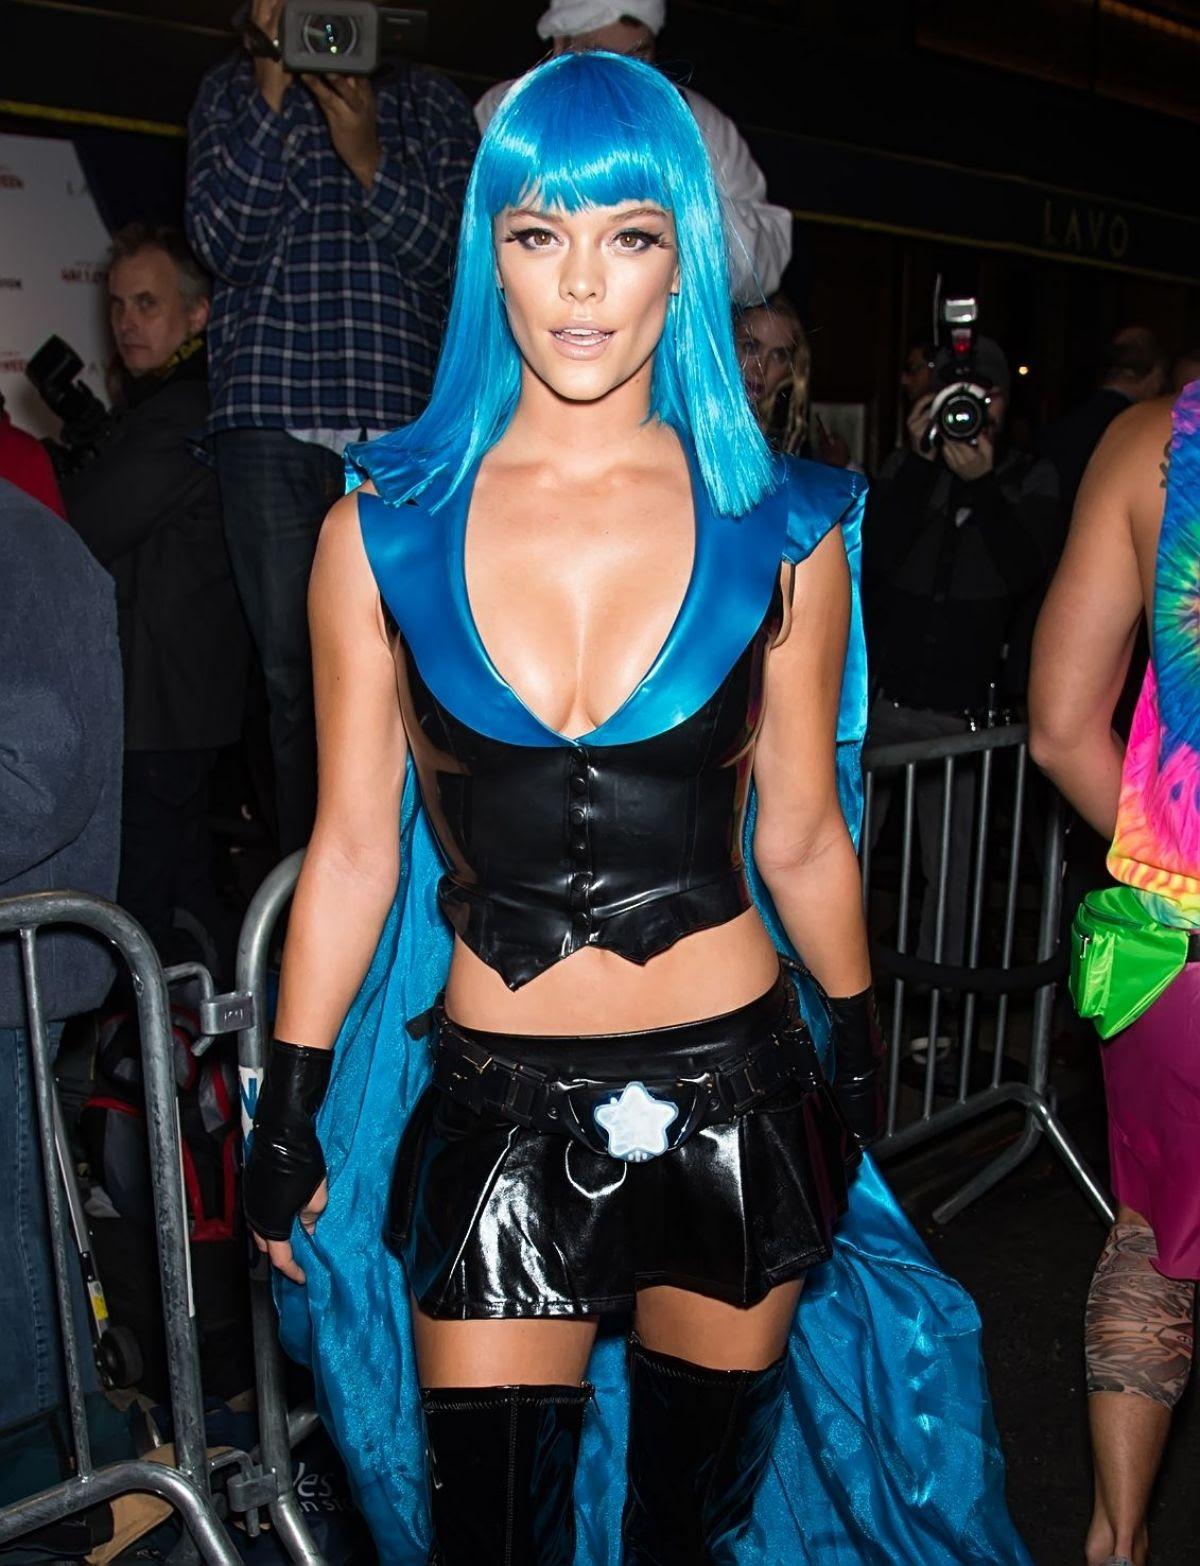 NINA AGDAL at Heidi Klum Halloween Party in New York 10/31/2015